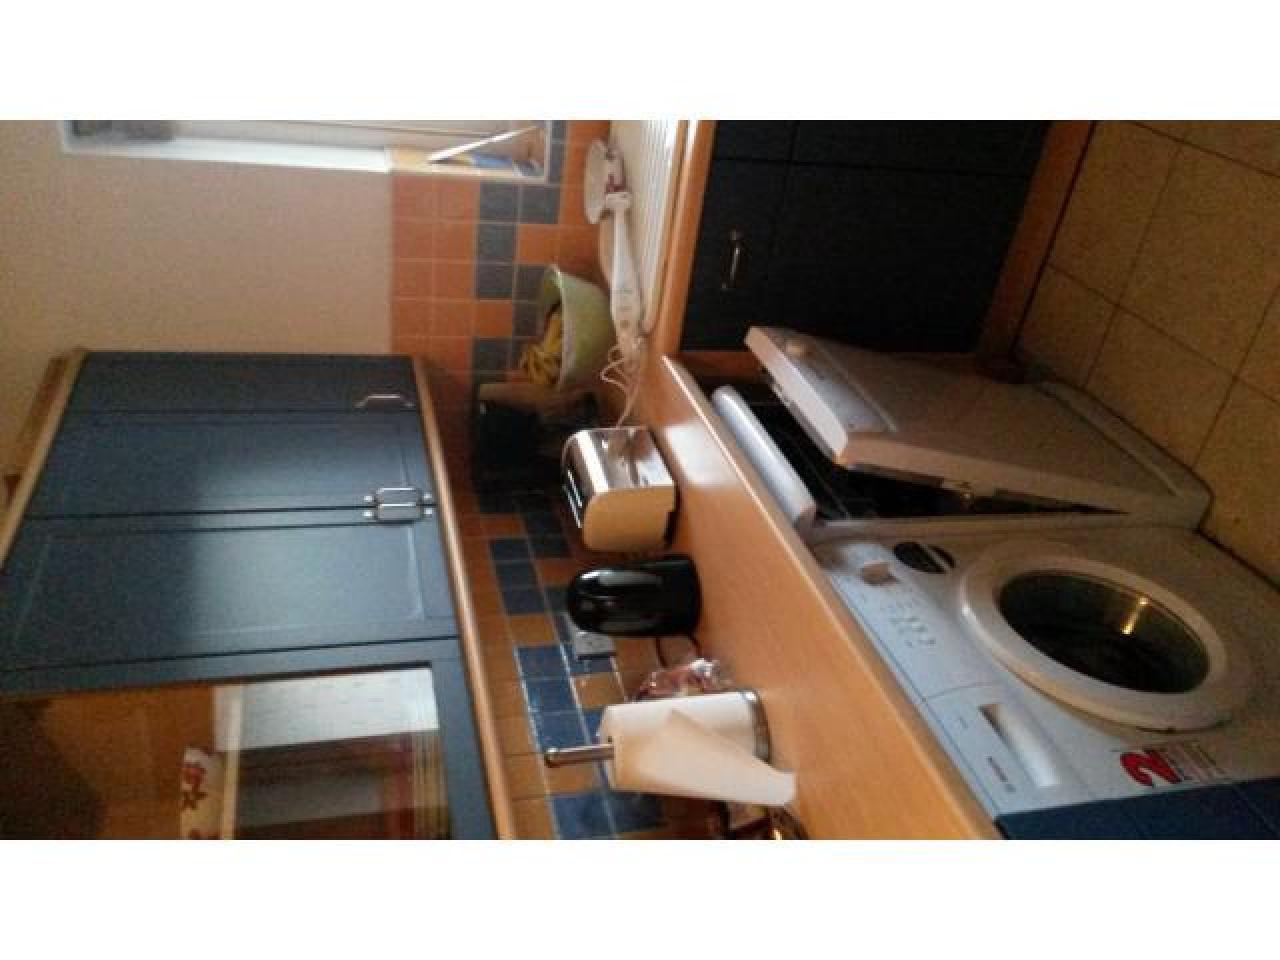 Сдаём 2-комнатную квартиру (one bedroom), Sougate, N14 (Лондон) - 4